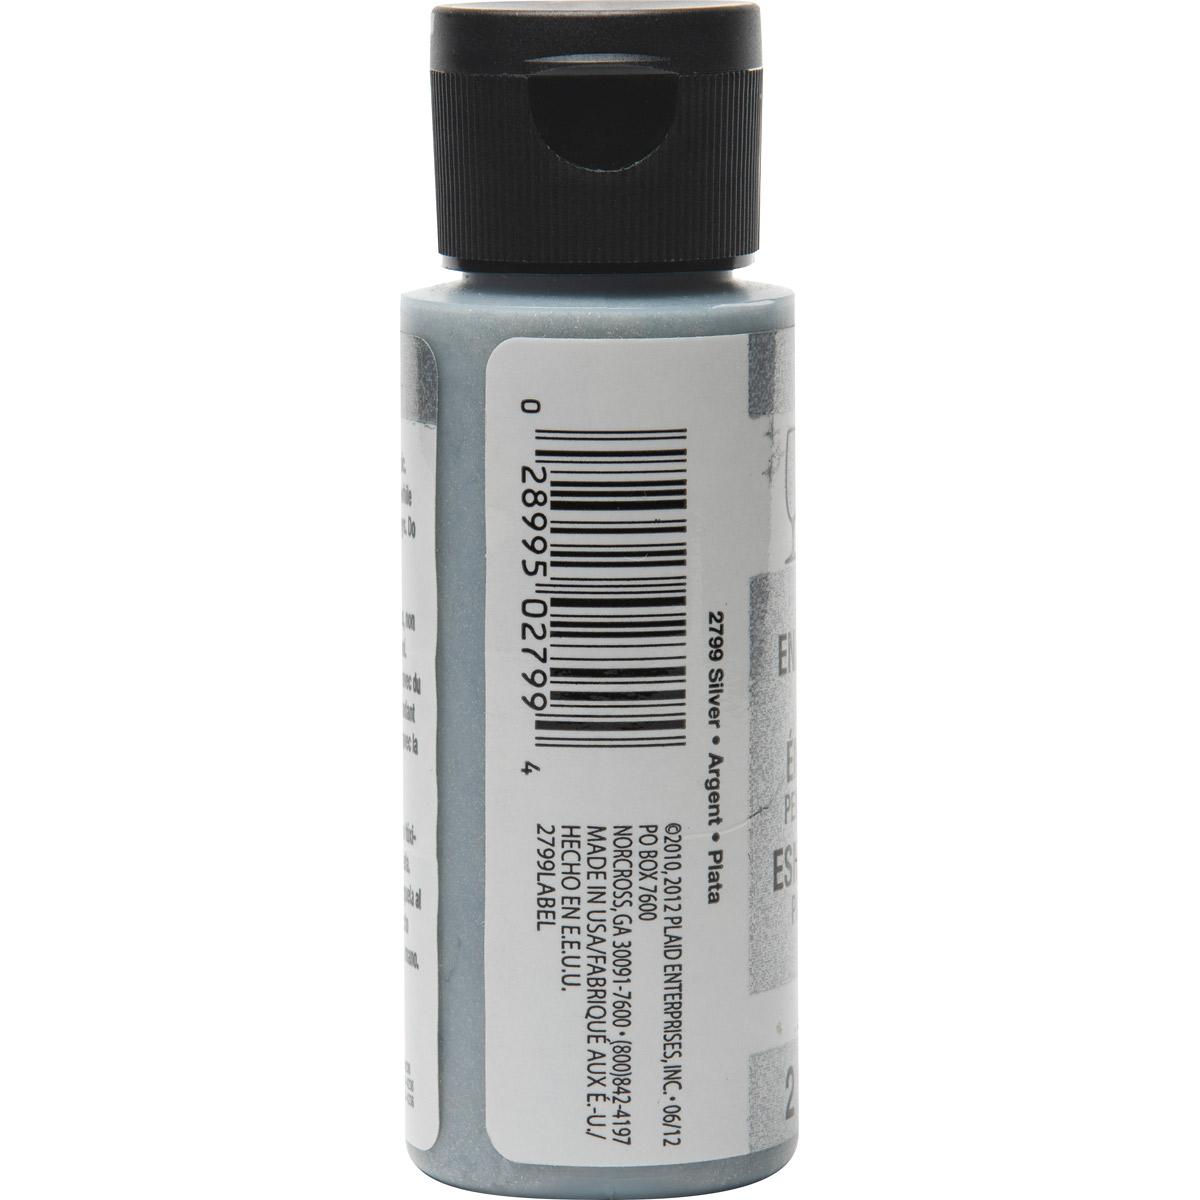 FolkArt ® Enamels™ - Glitter Silver, 2 oz. - 2799